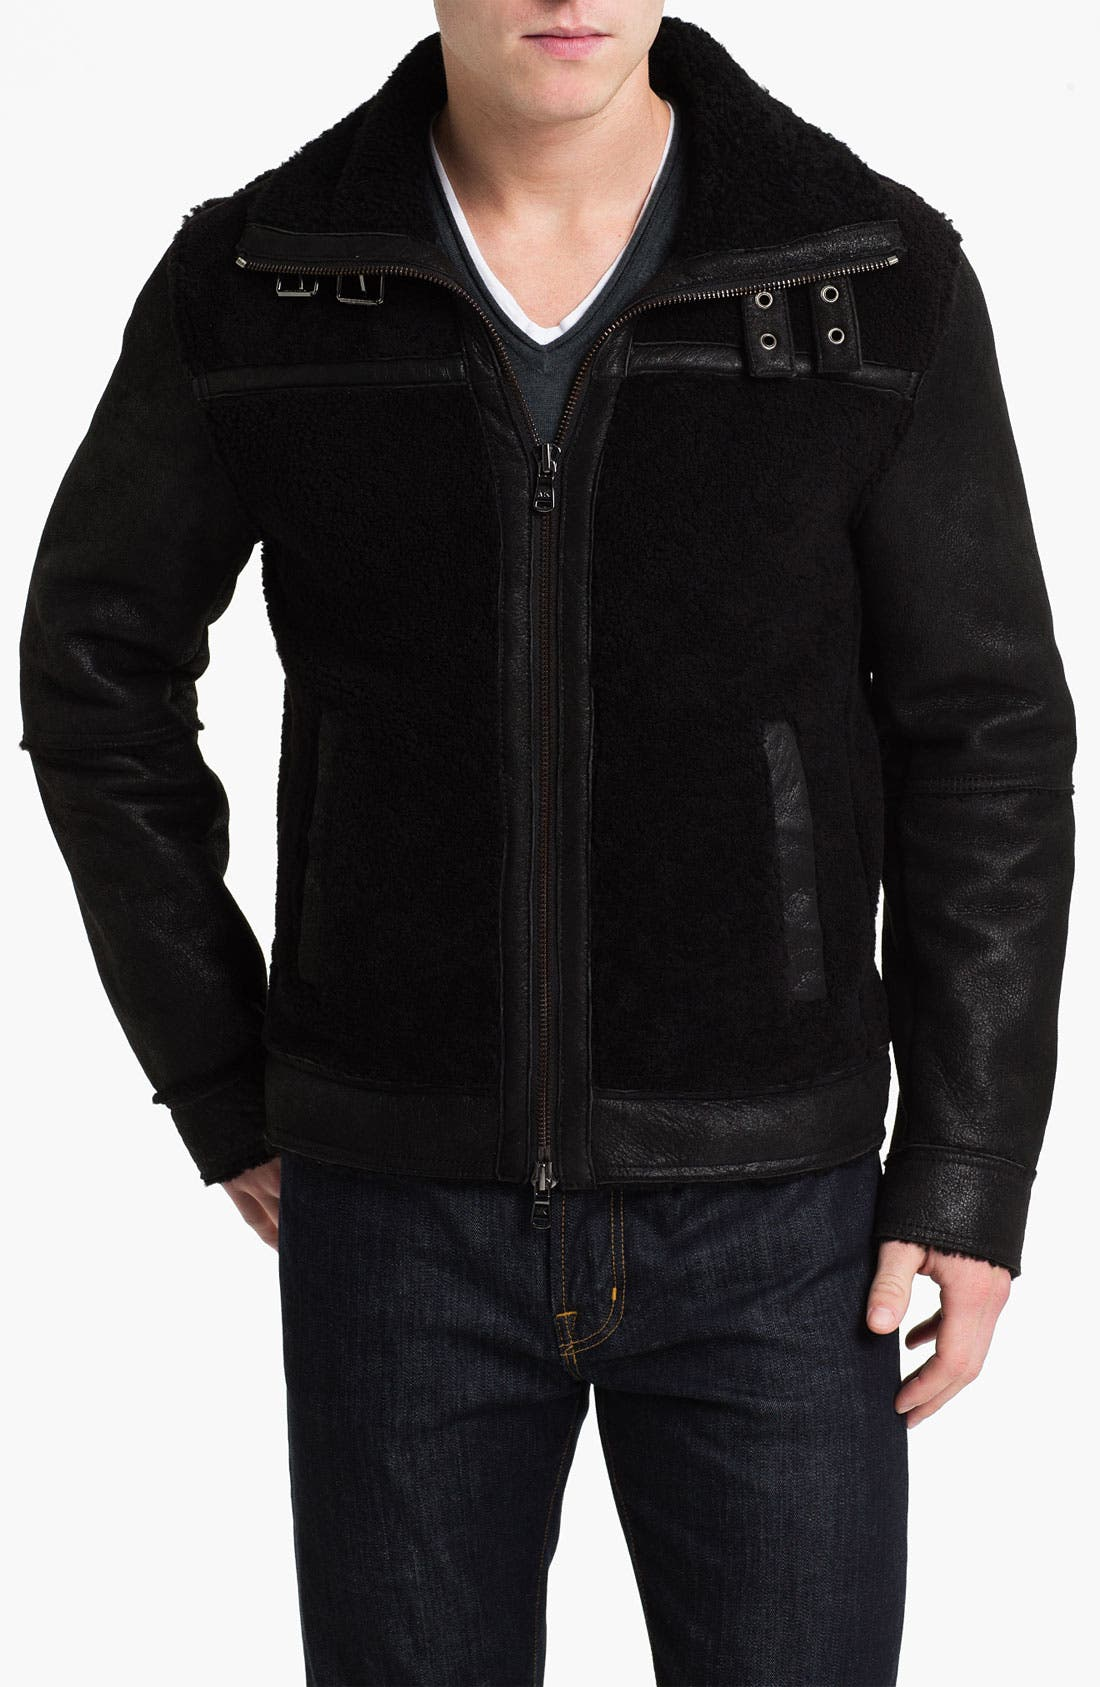 Main Image - Michael Kors Shearling Racer Jacket